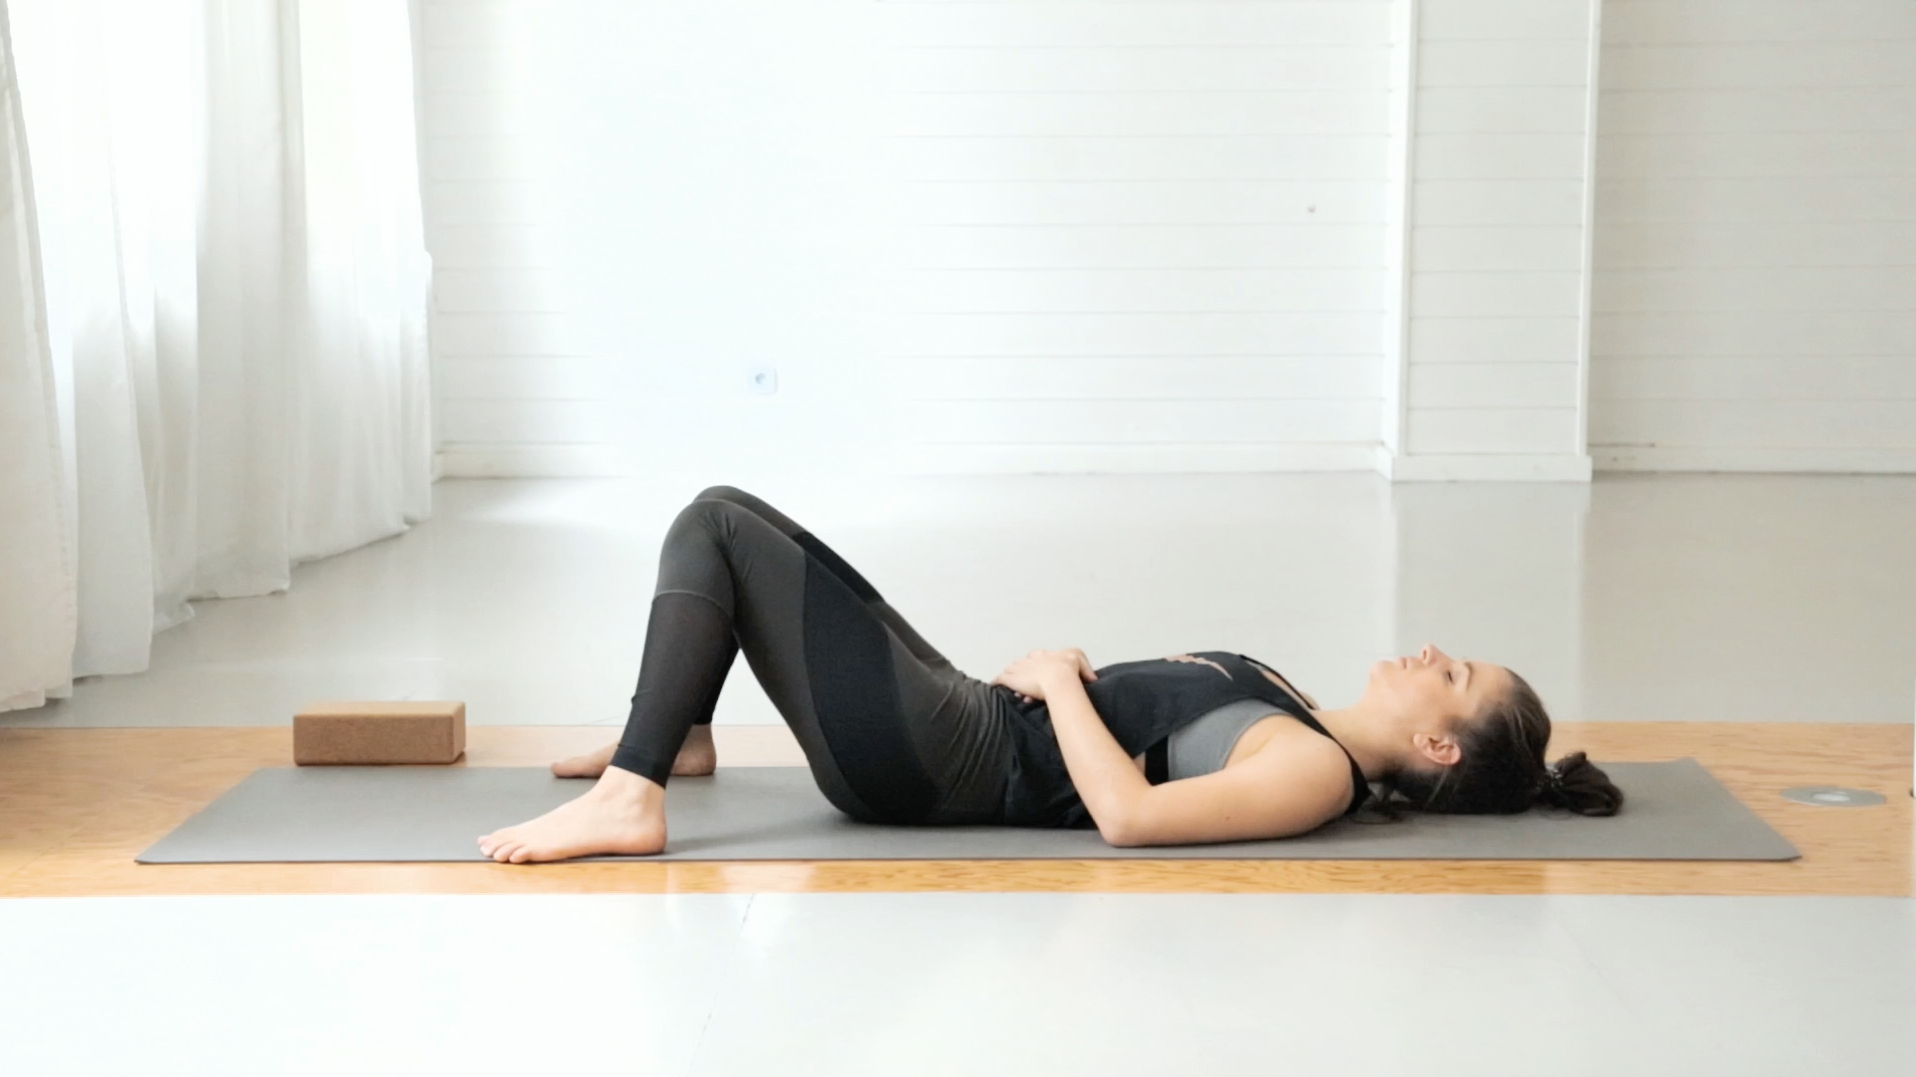 beine-po-booty-yoga-mady-morrison-03